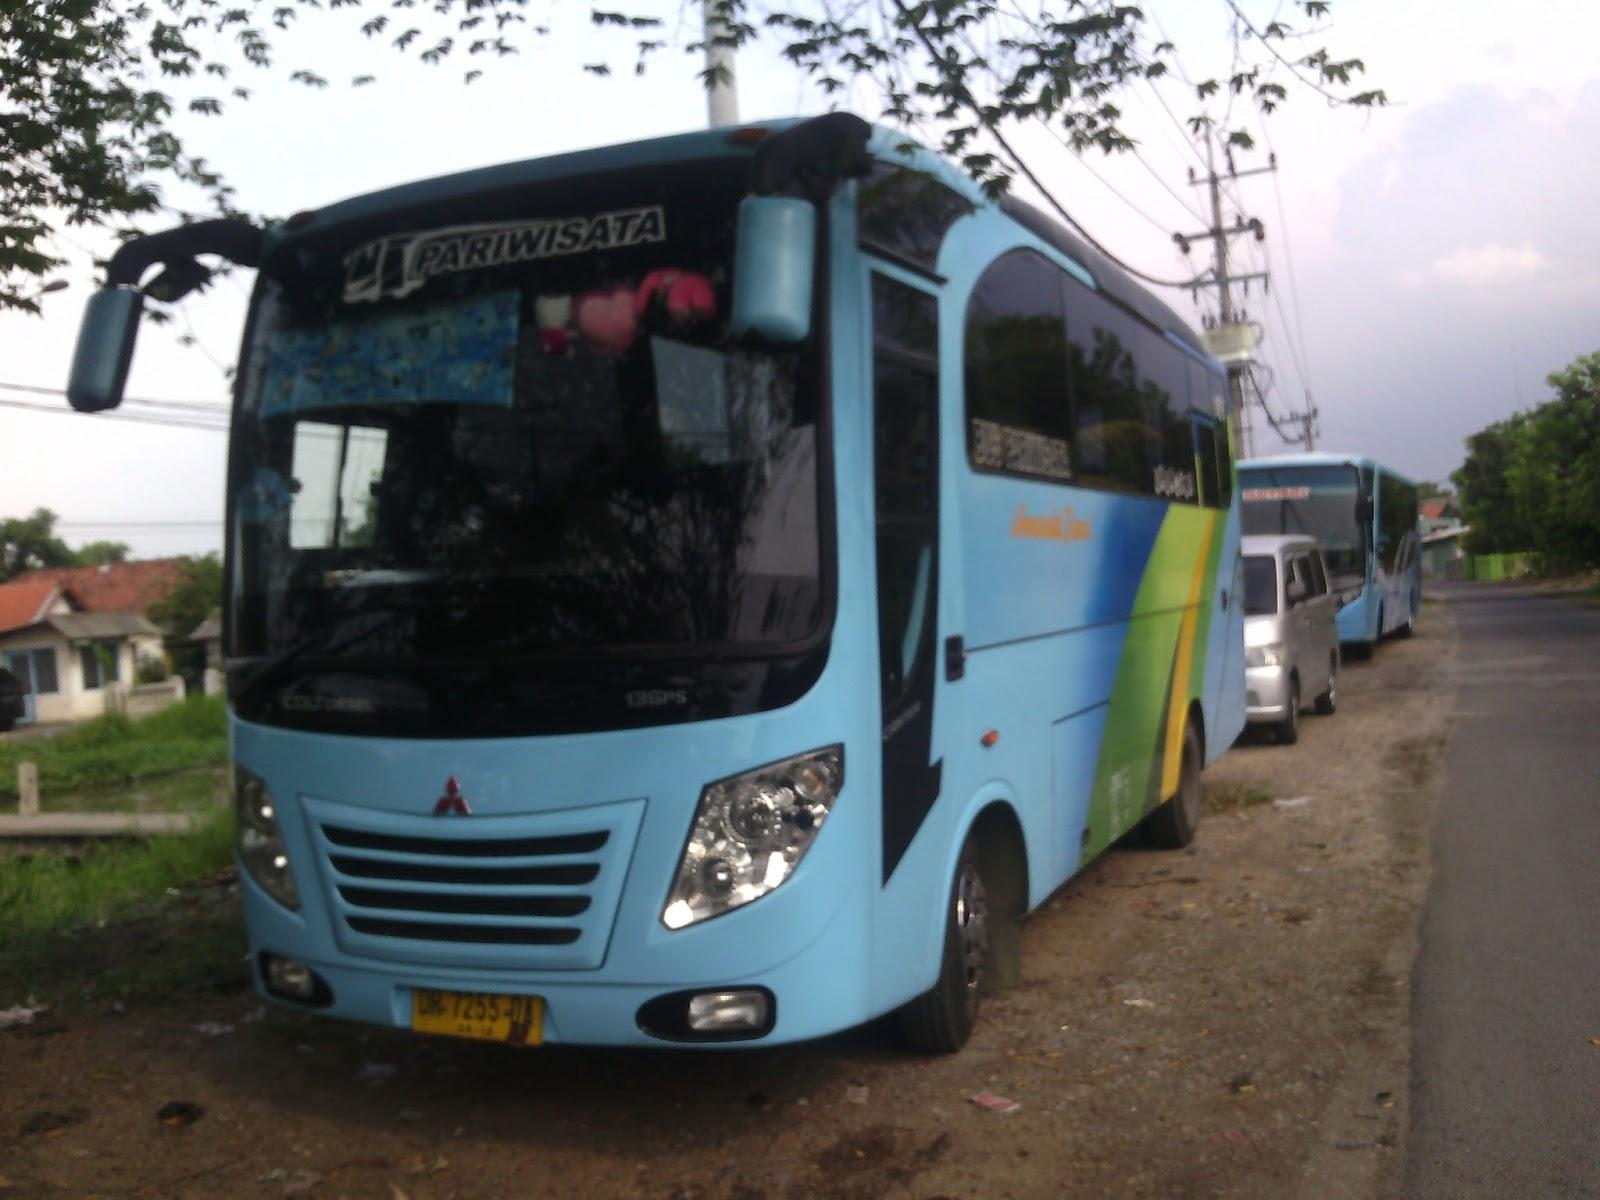 Sewa Bus Pariwisata PO. Bozz Moeda Surabaya - Carter Bus ...